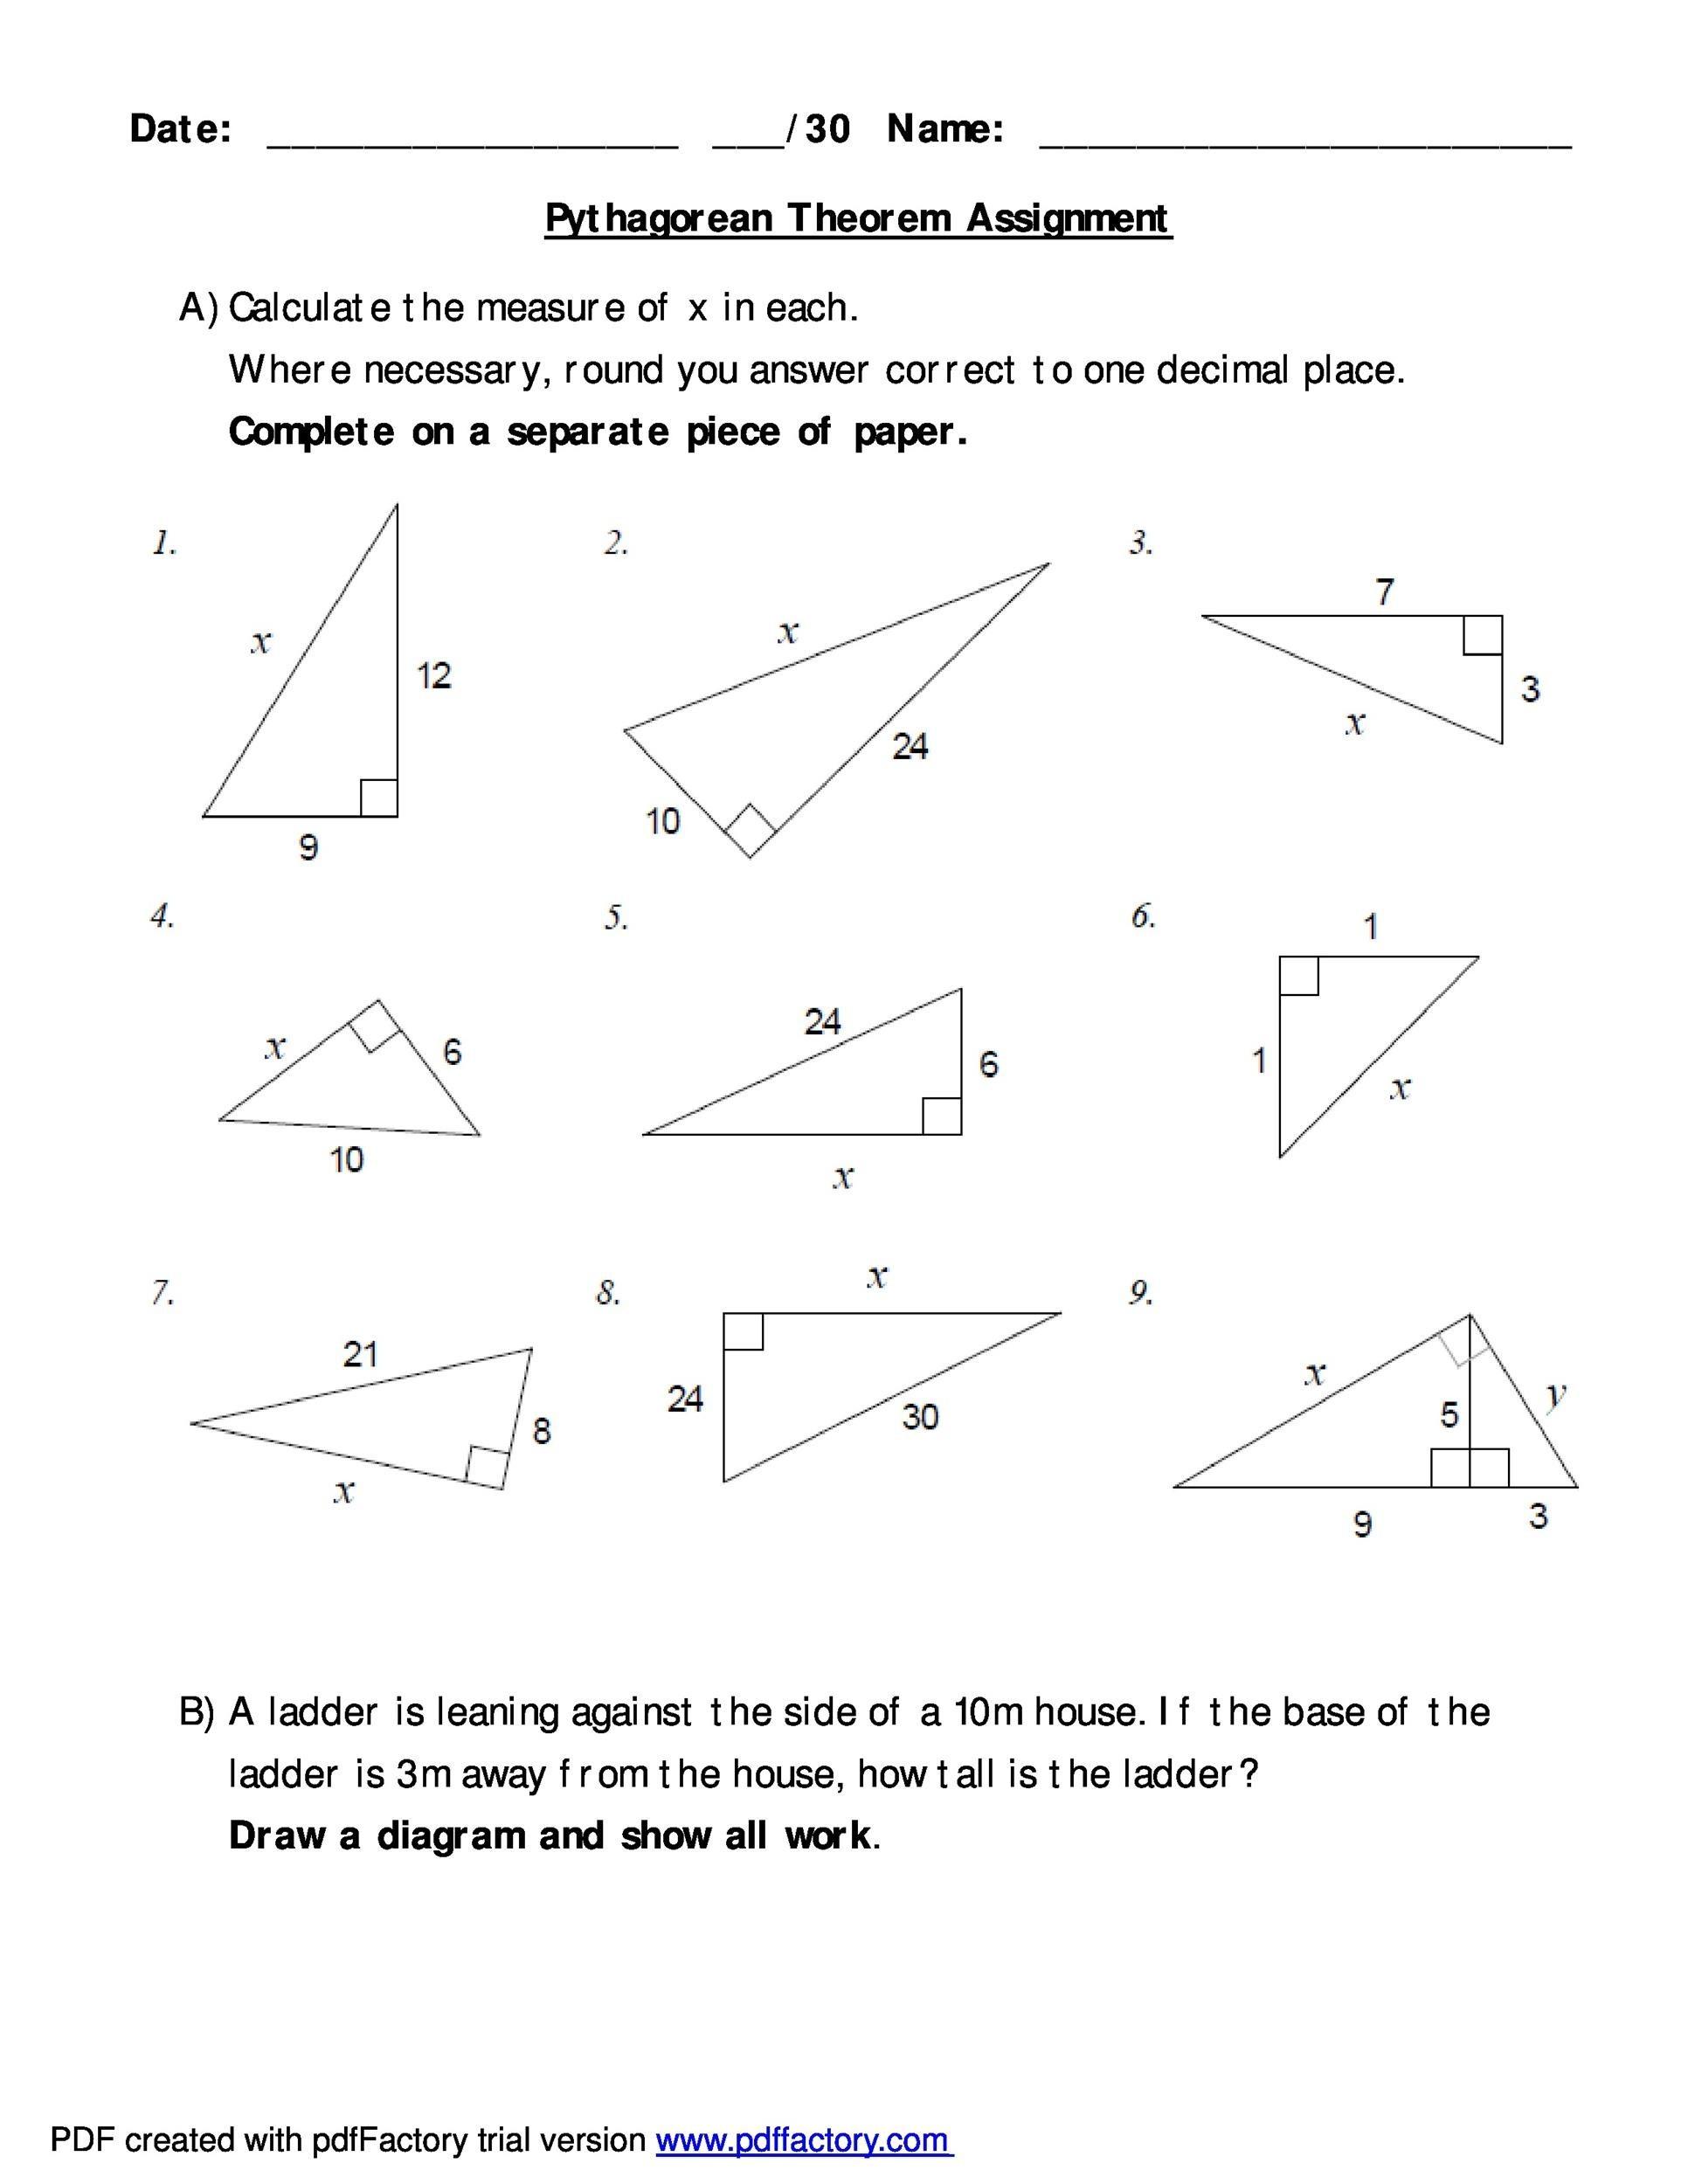 Workbooks pythagorean theorem worksheets pdf : Pythagorean Theorem Word Problems Worksheet - 28 templates ...